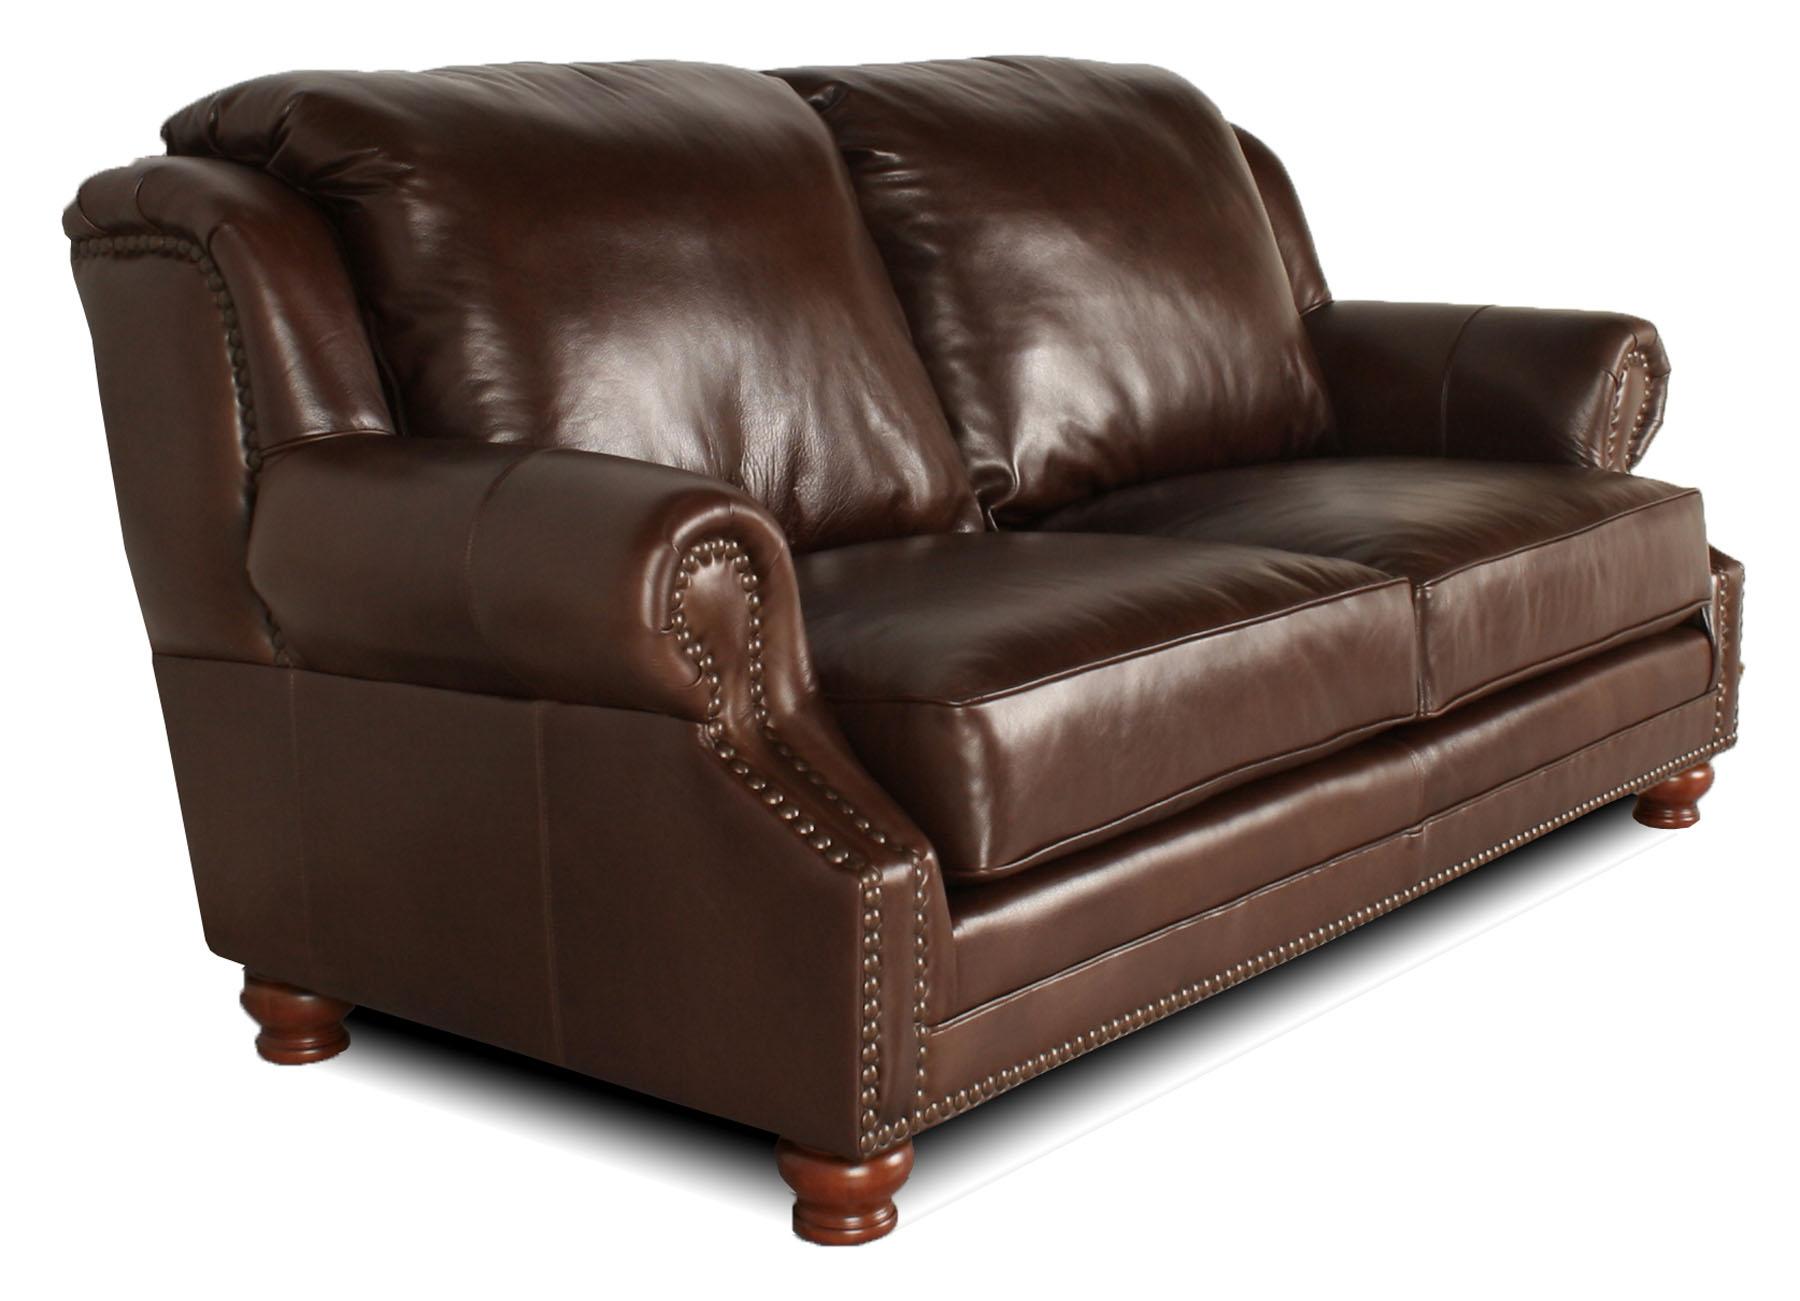 Kimball Leather Furniture